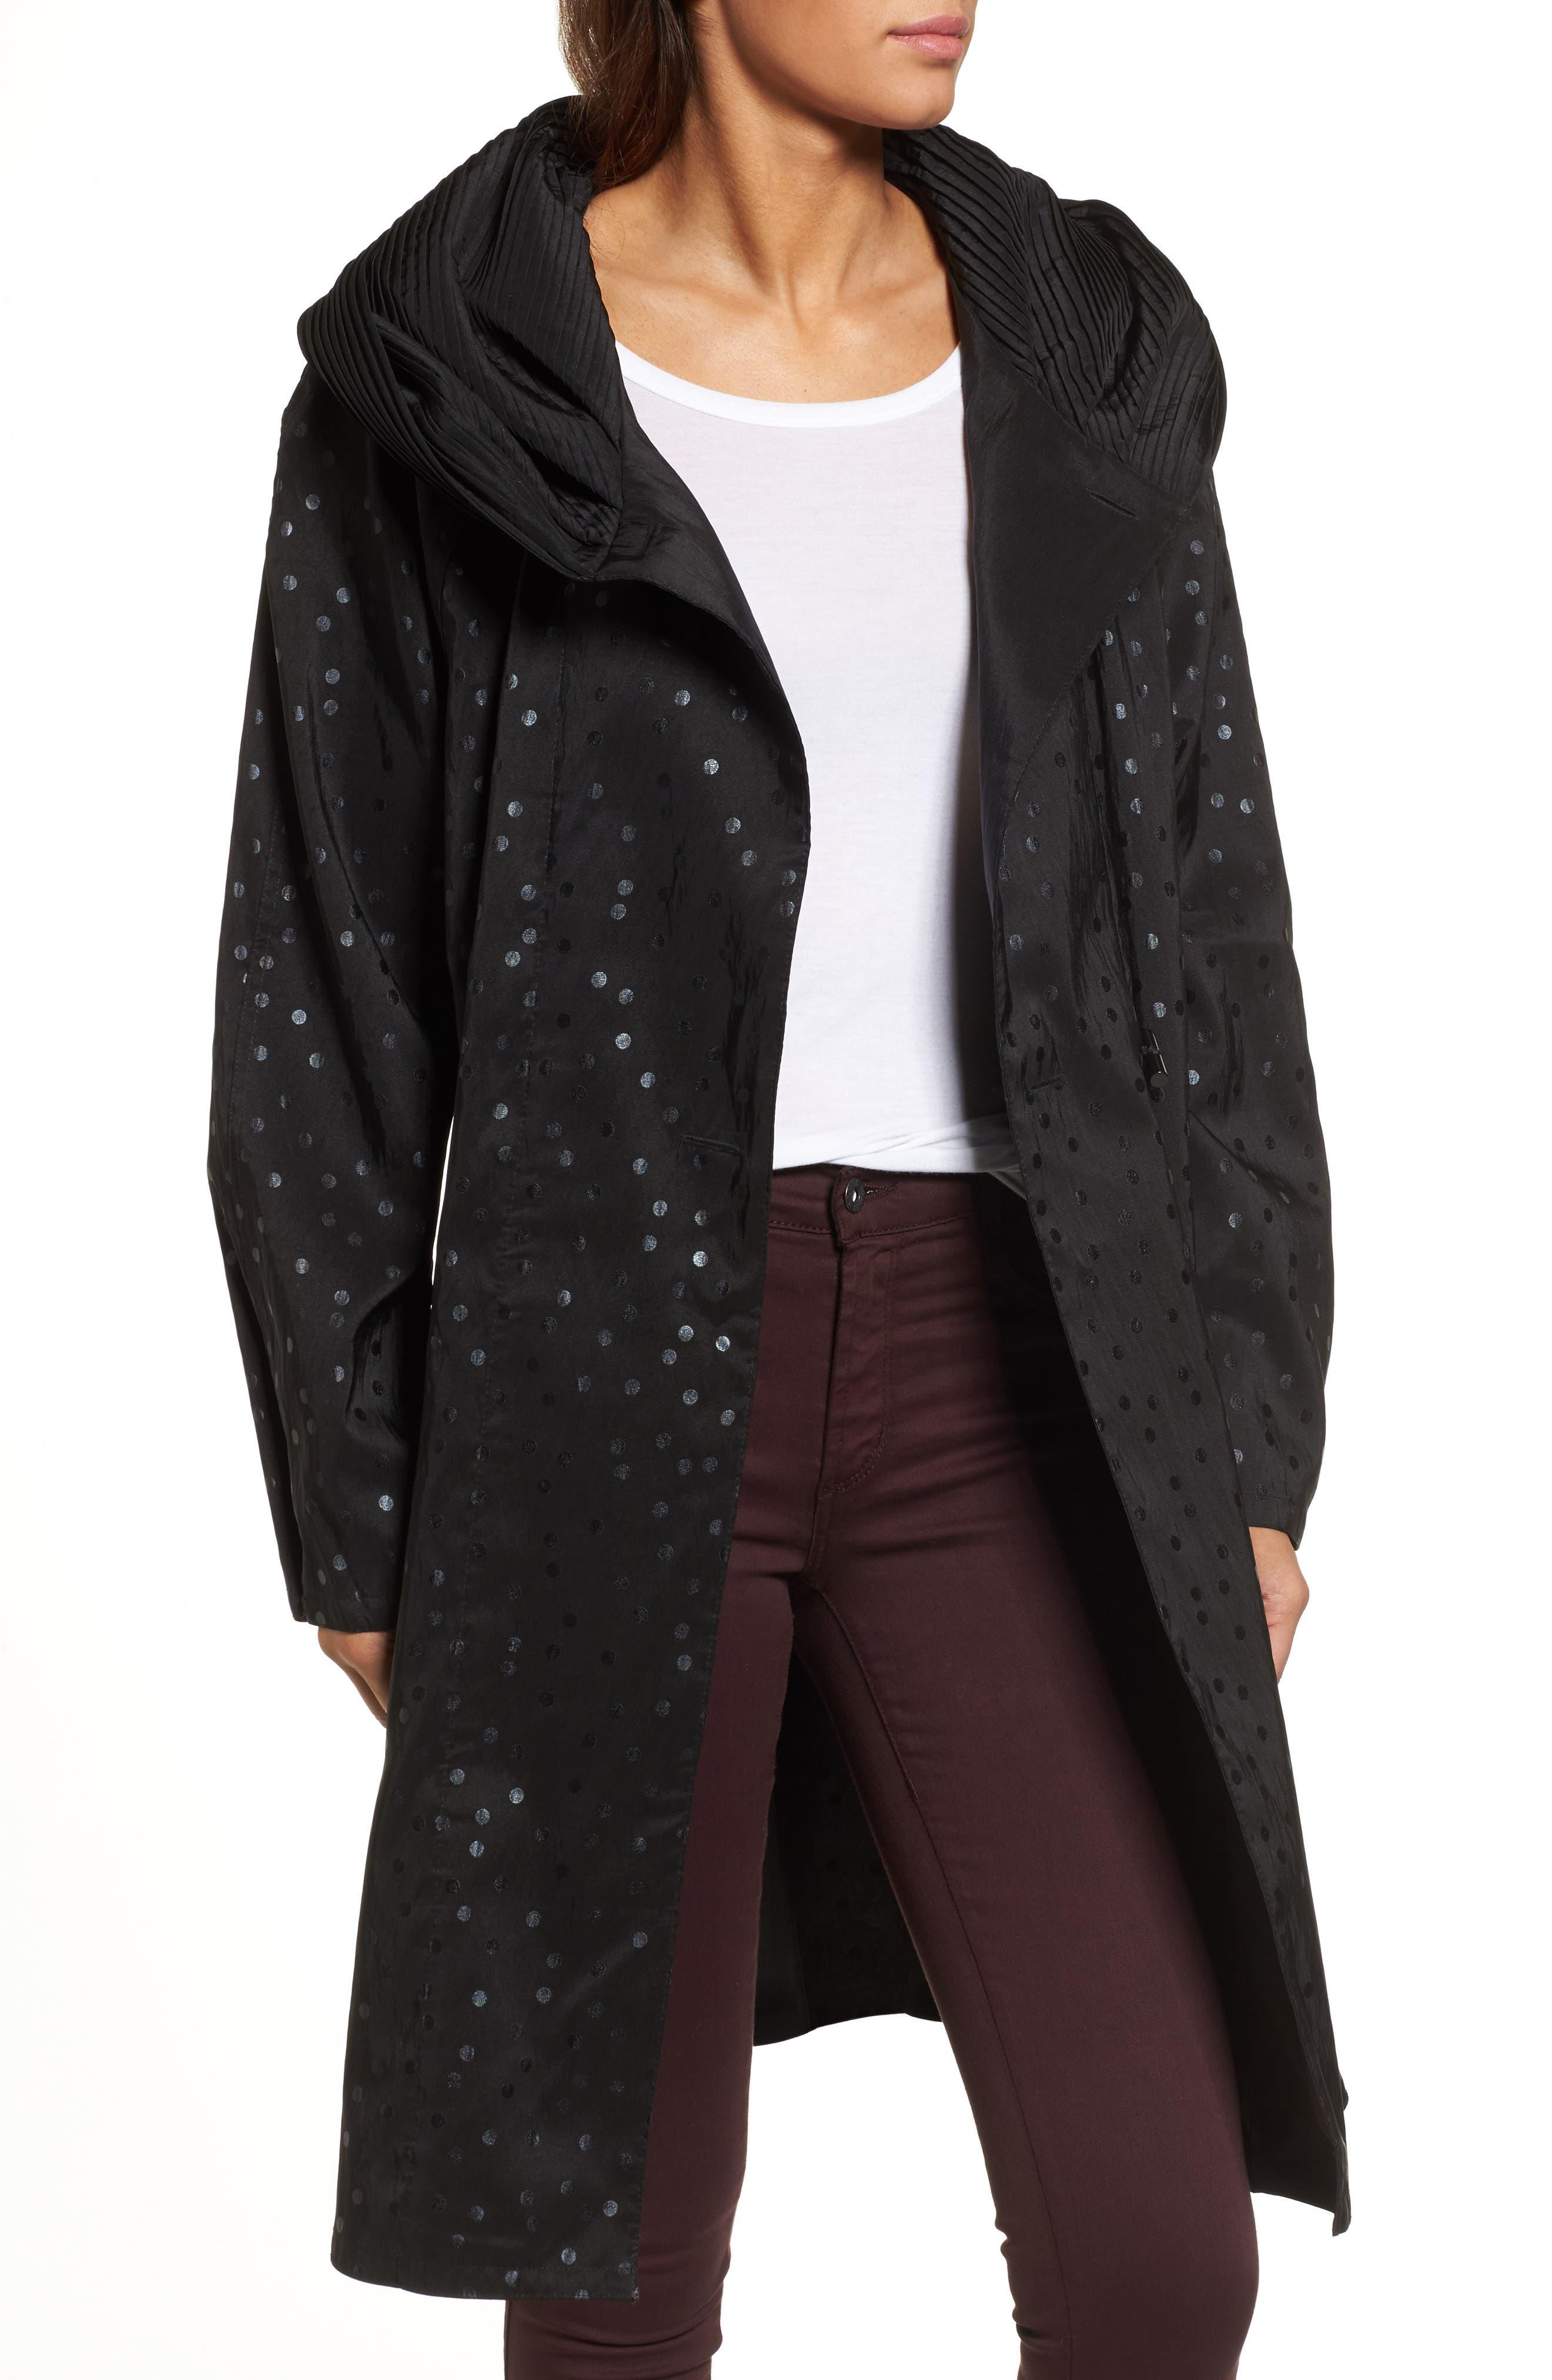 'Donatella' Reversible Dot Pleat Hood Packable Travel Coat,                             Main thumbnail 1, color,                             Black Dot